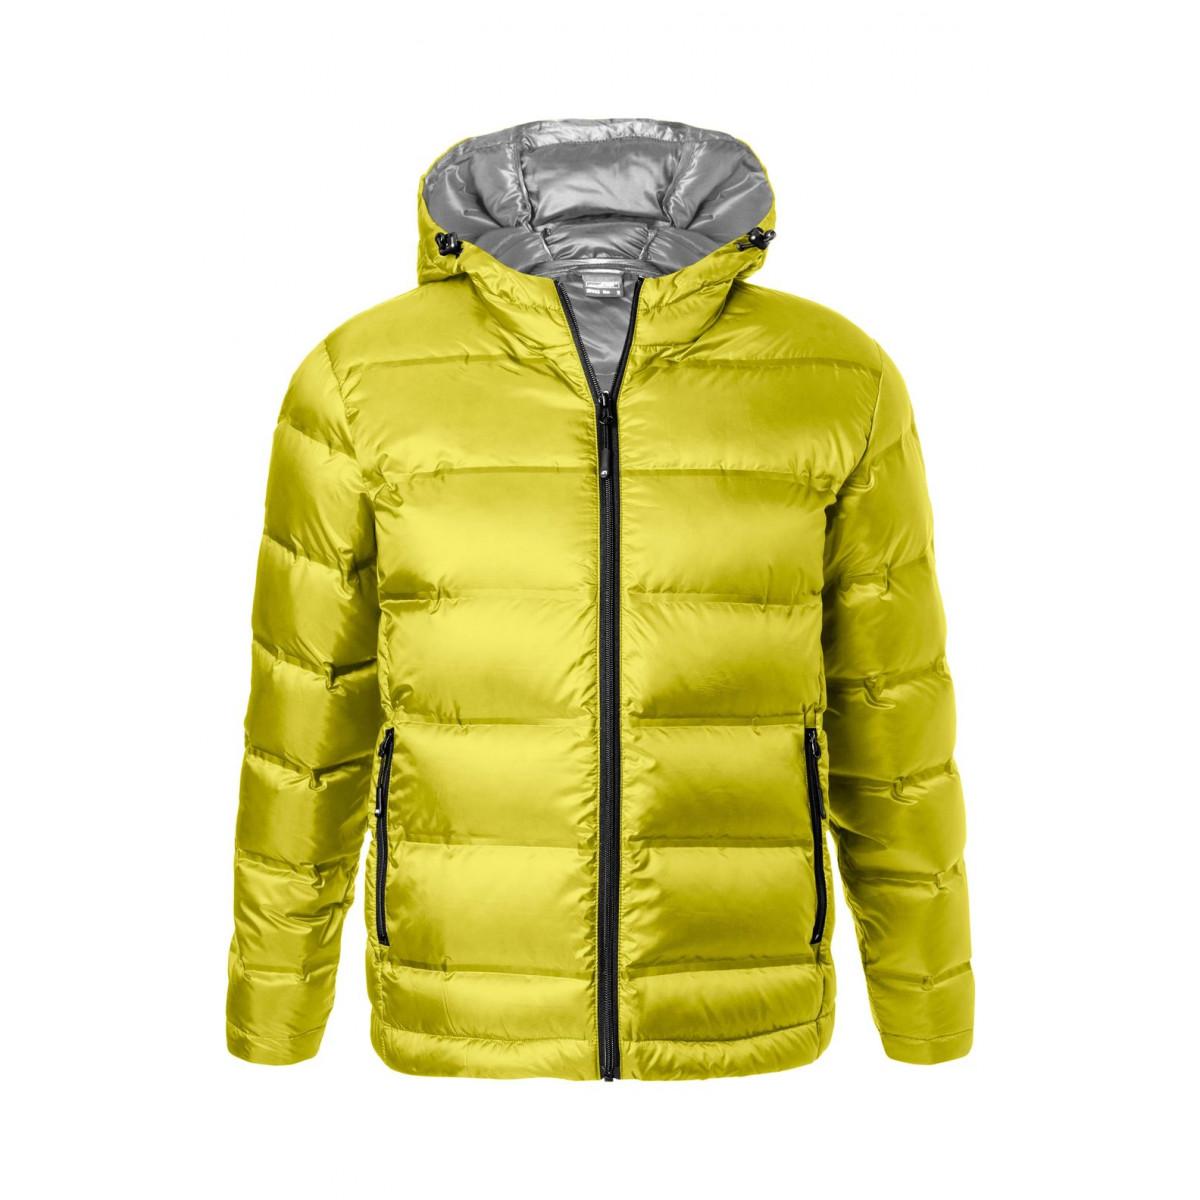 Куртка мужская JN1152 Mens Hooded Down Jacket - Желтый/Серебряный